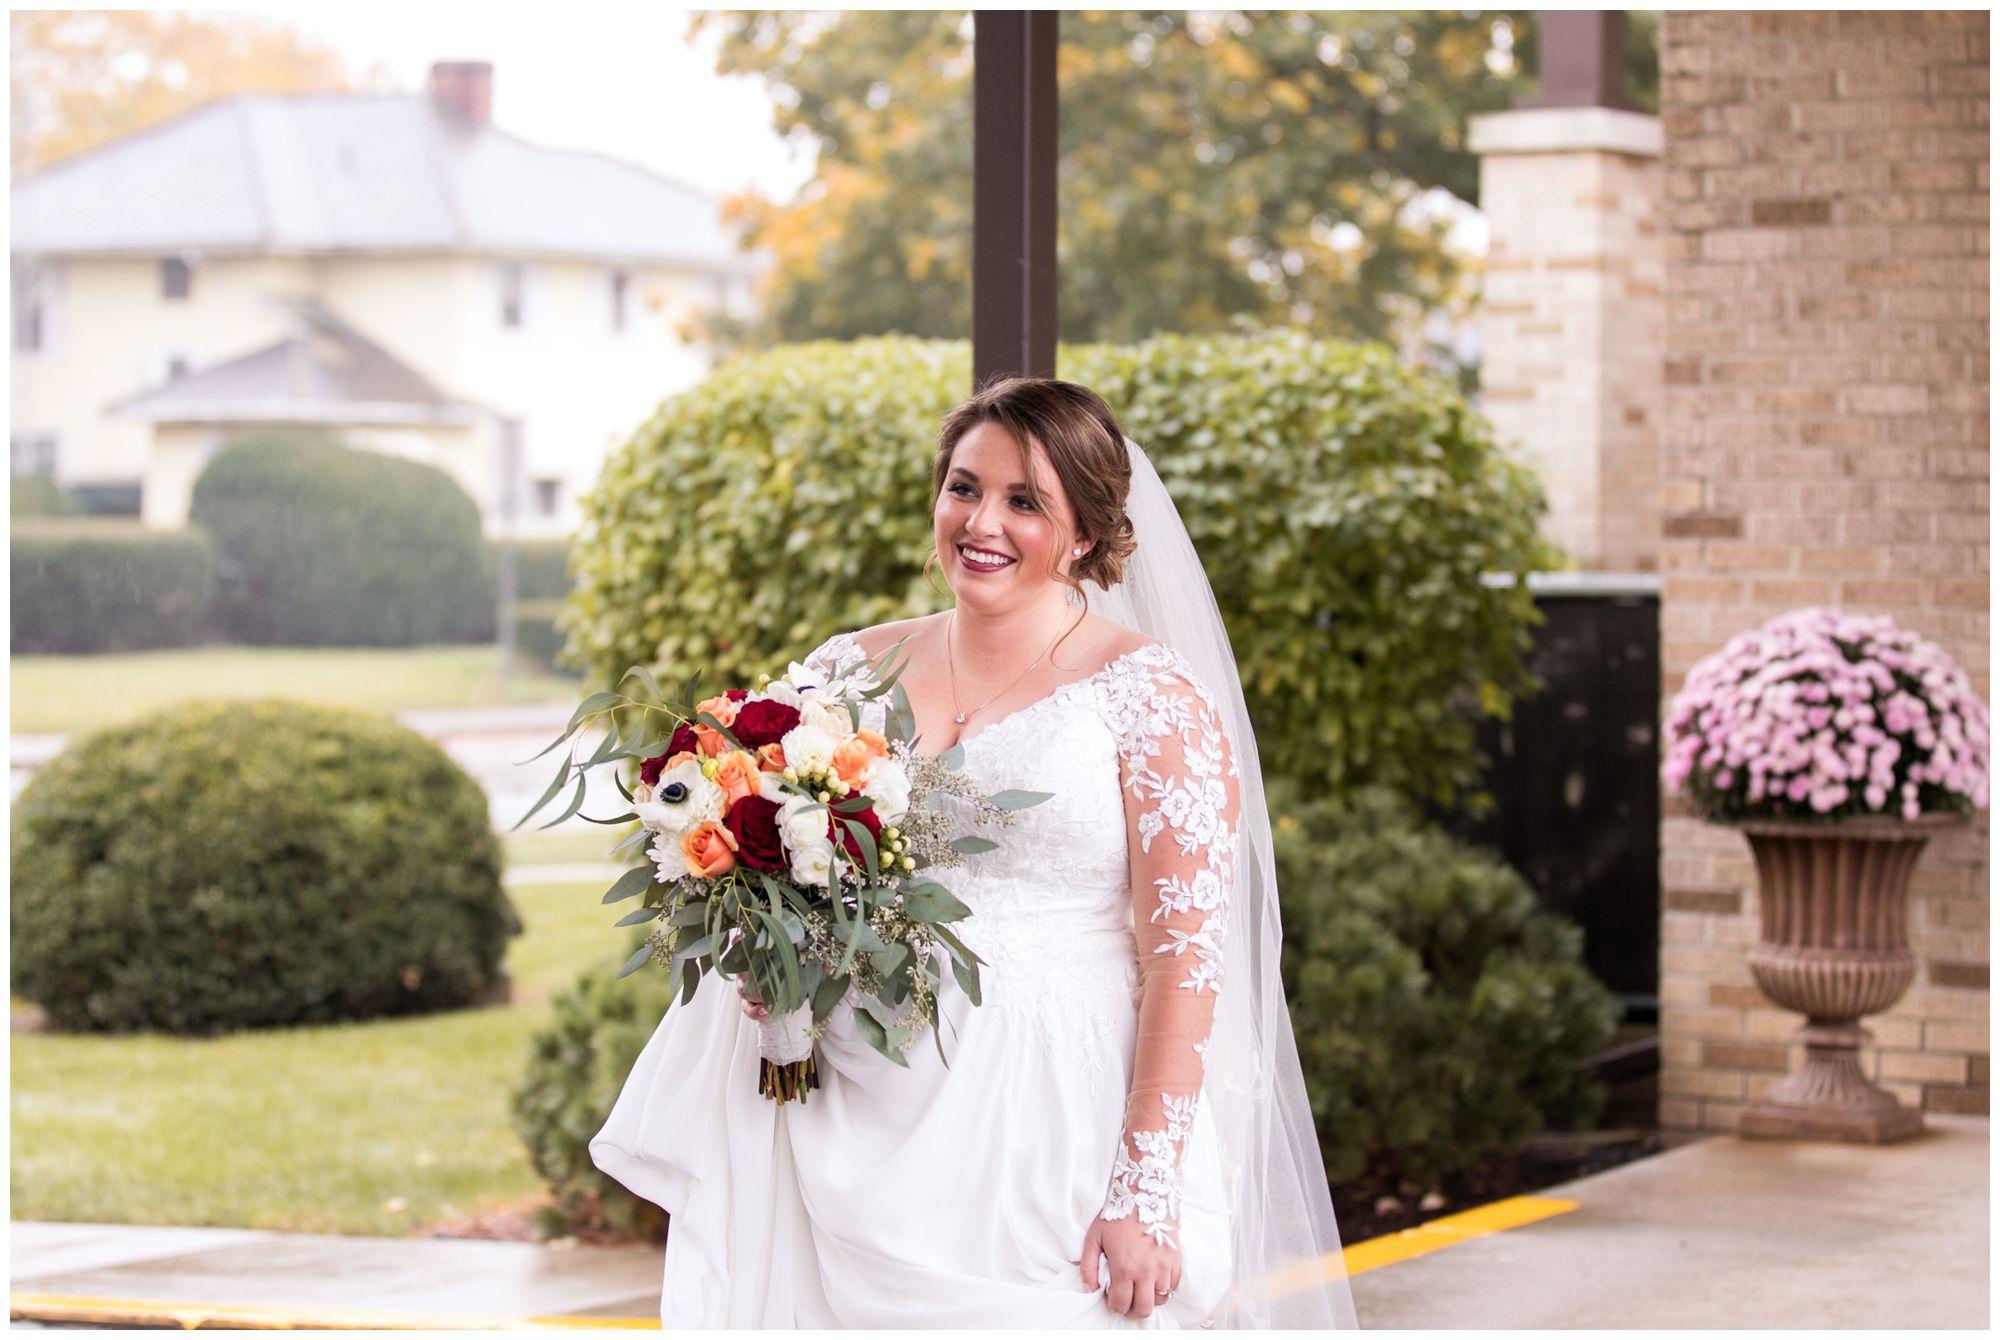 bride walks toward groom during first look in Decatur, Indiana